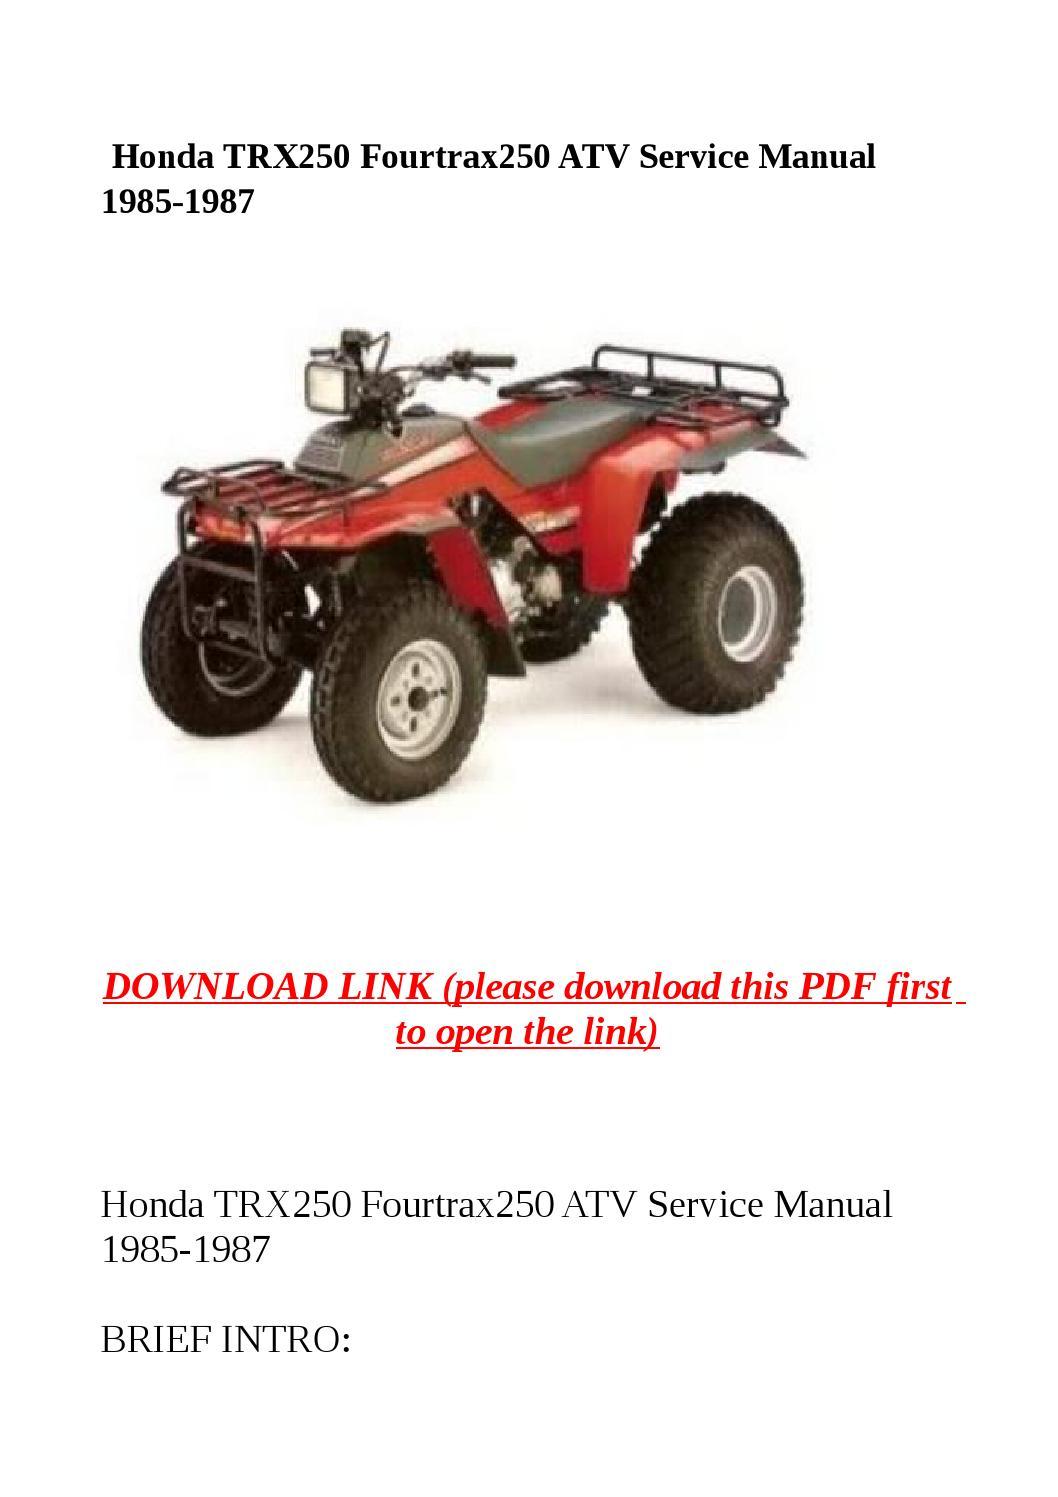 1986-1987 Honda Fourtrax 250 TRX250 Foot Brake Cable